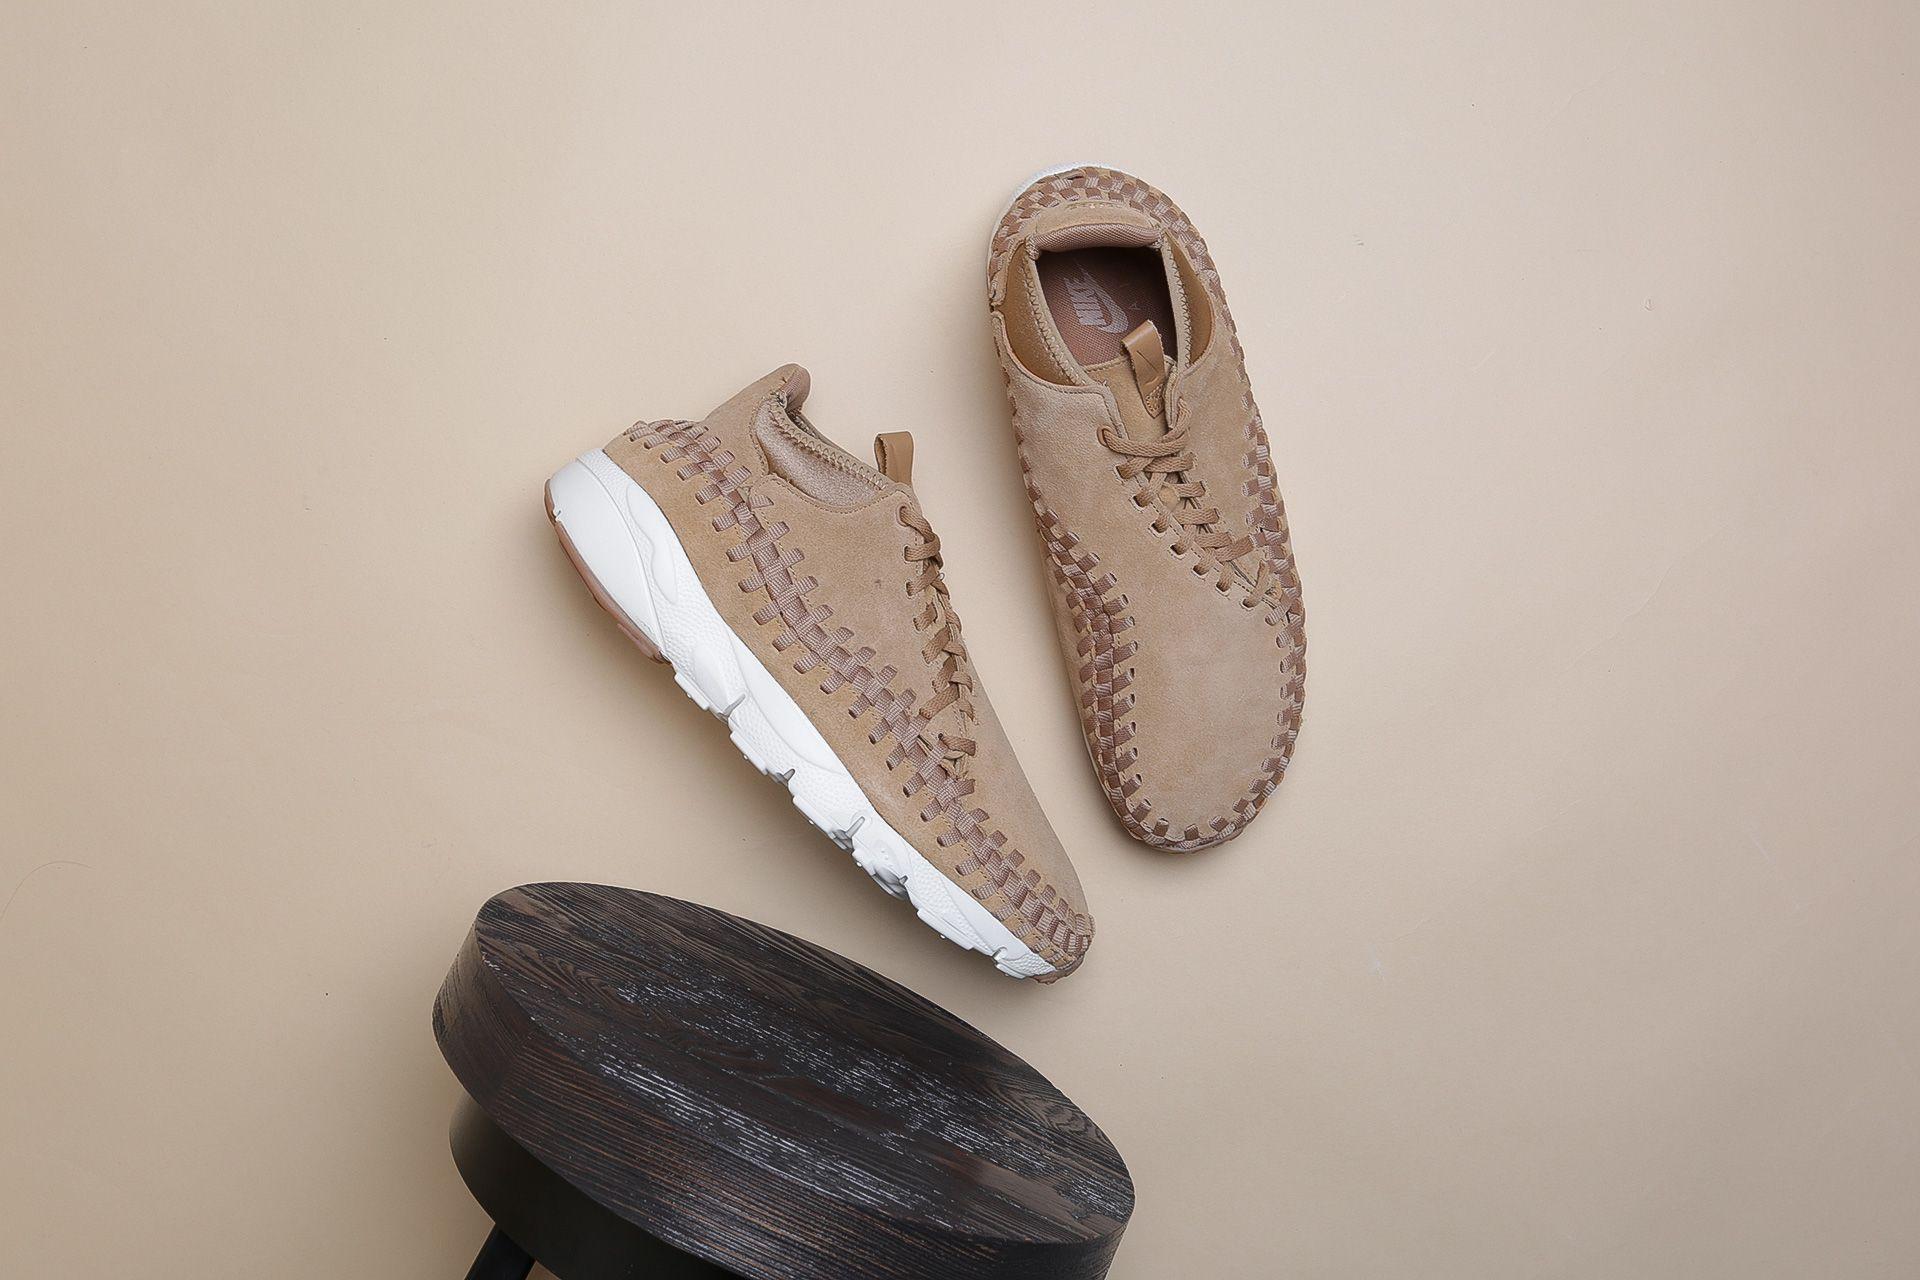 the latest 53928 c5c65 Купить мужские кроссовки Nike Air Footscape Woven Chukka